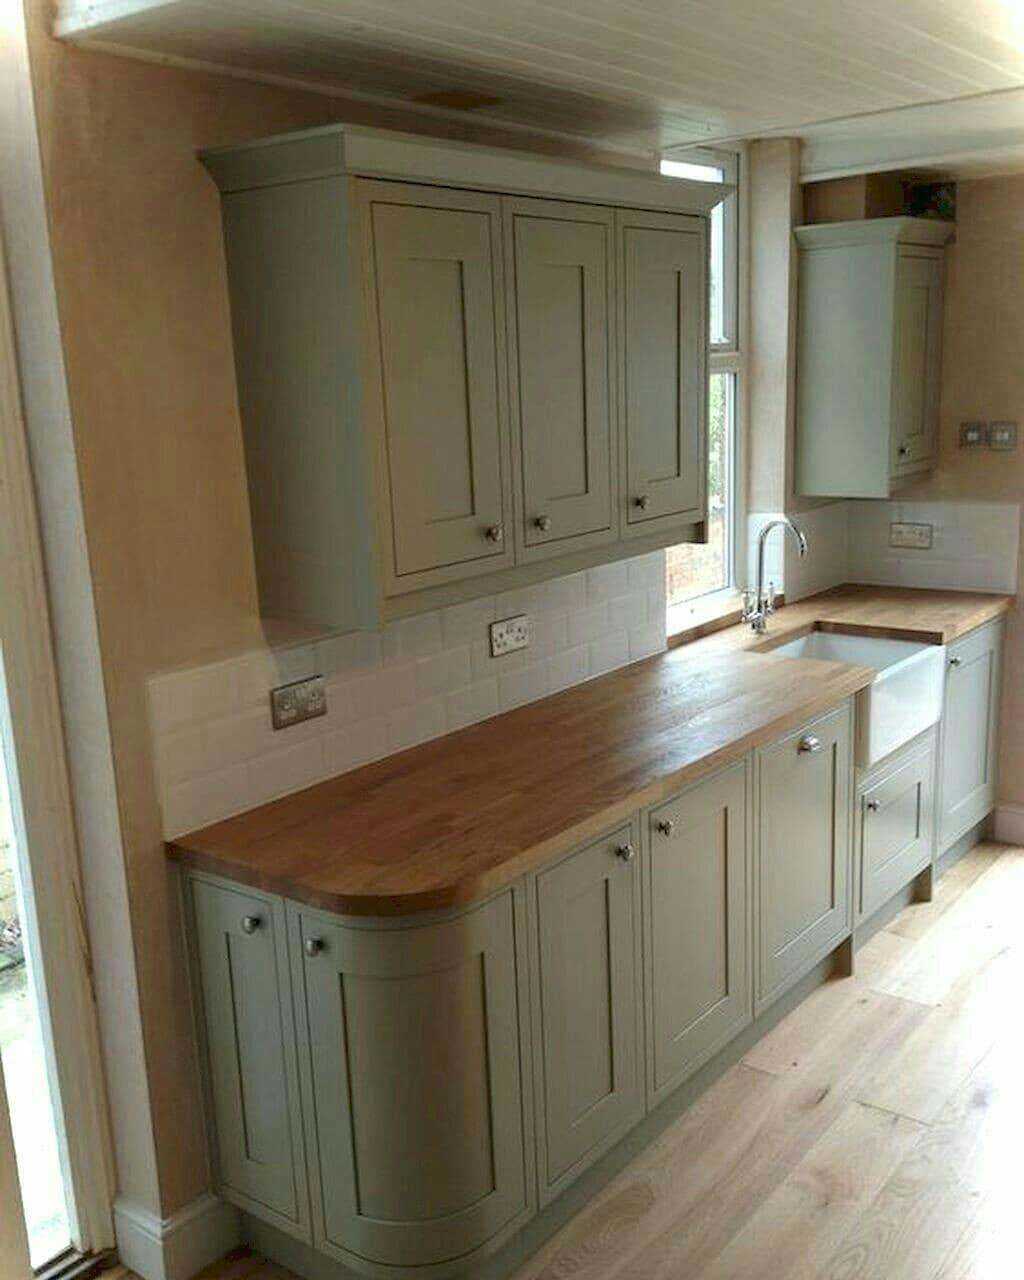 Kitchen Set Duco Created By Casa Zerin Decor 081212216409